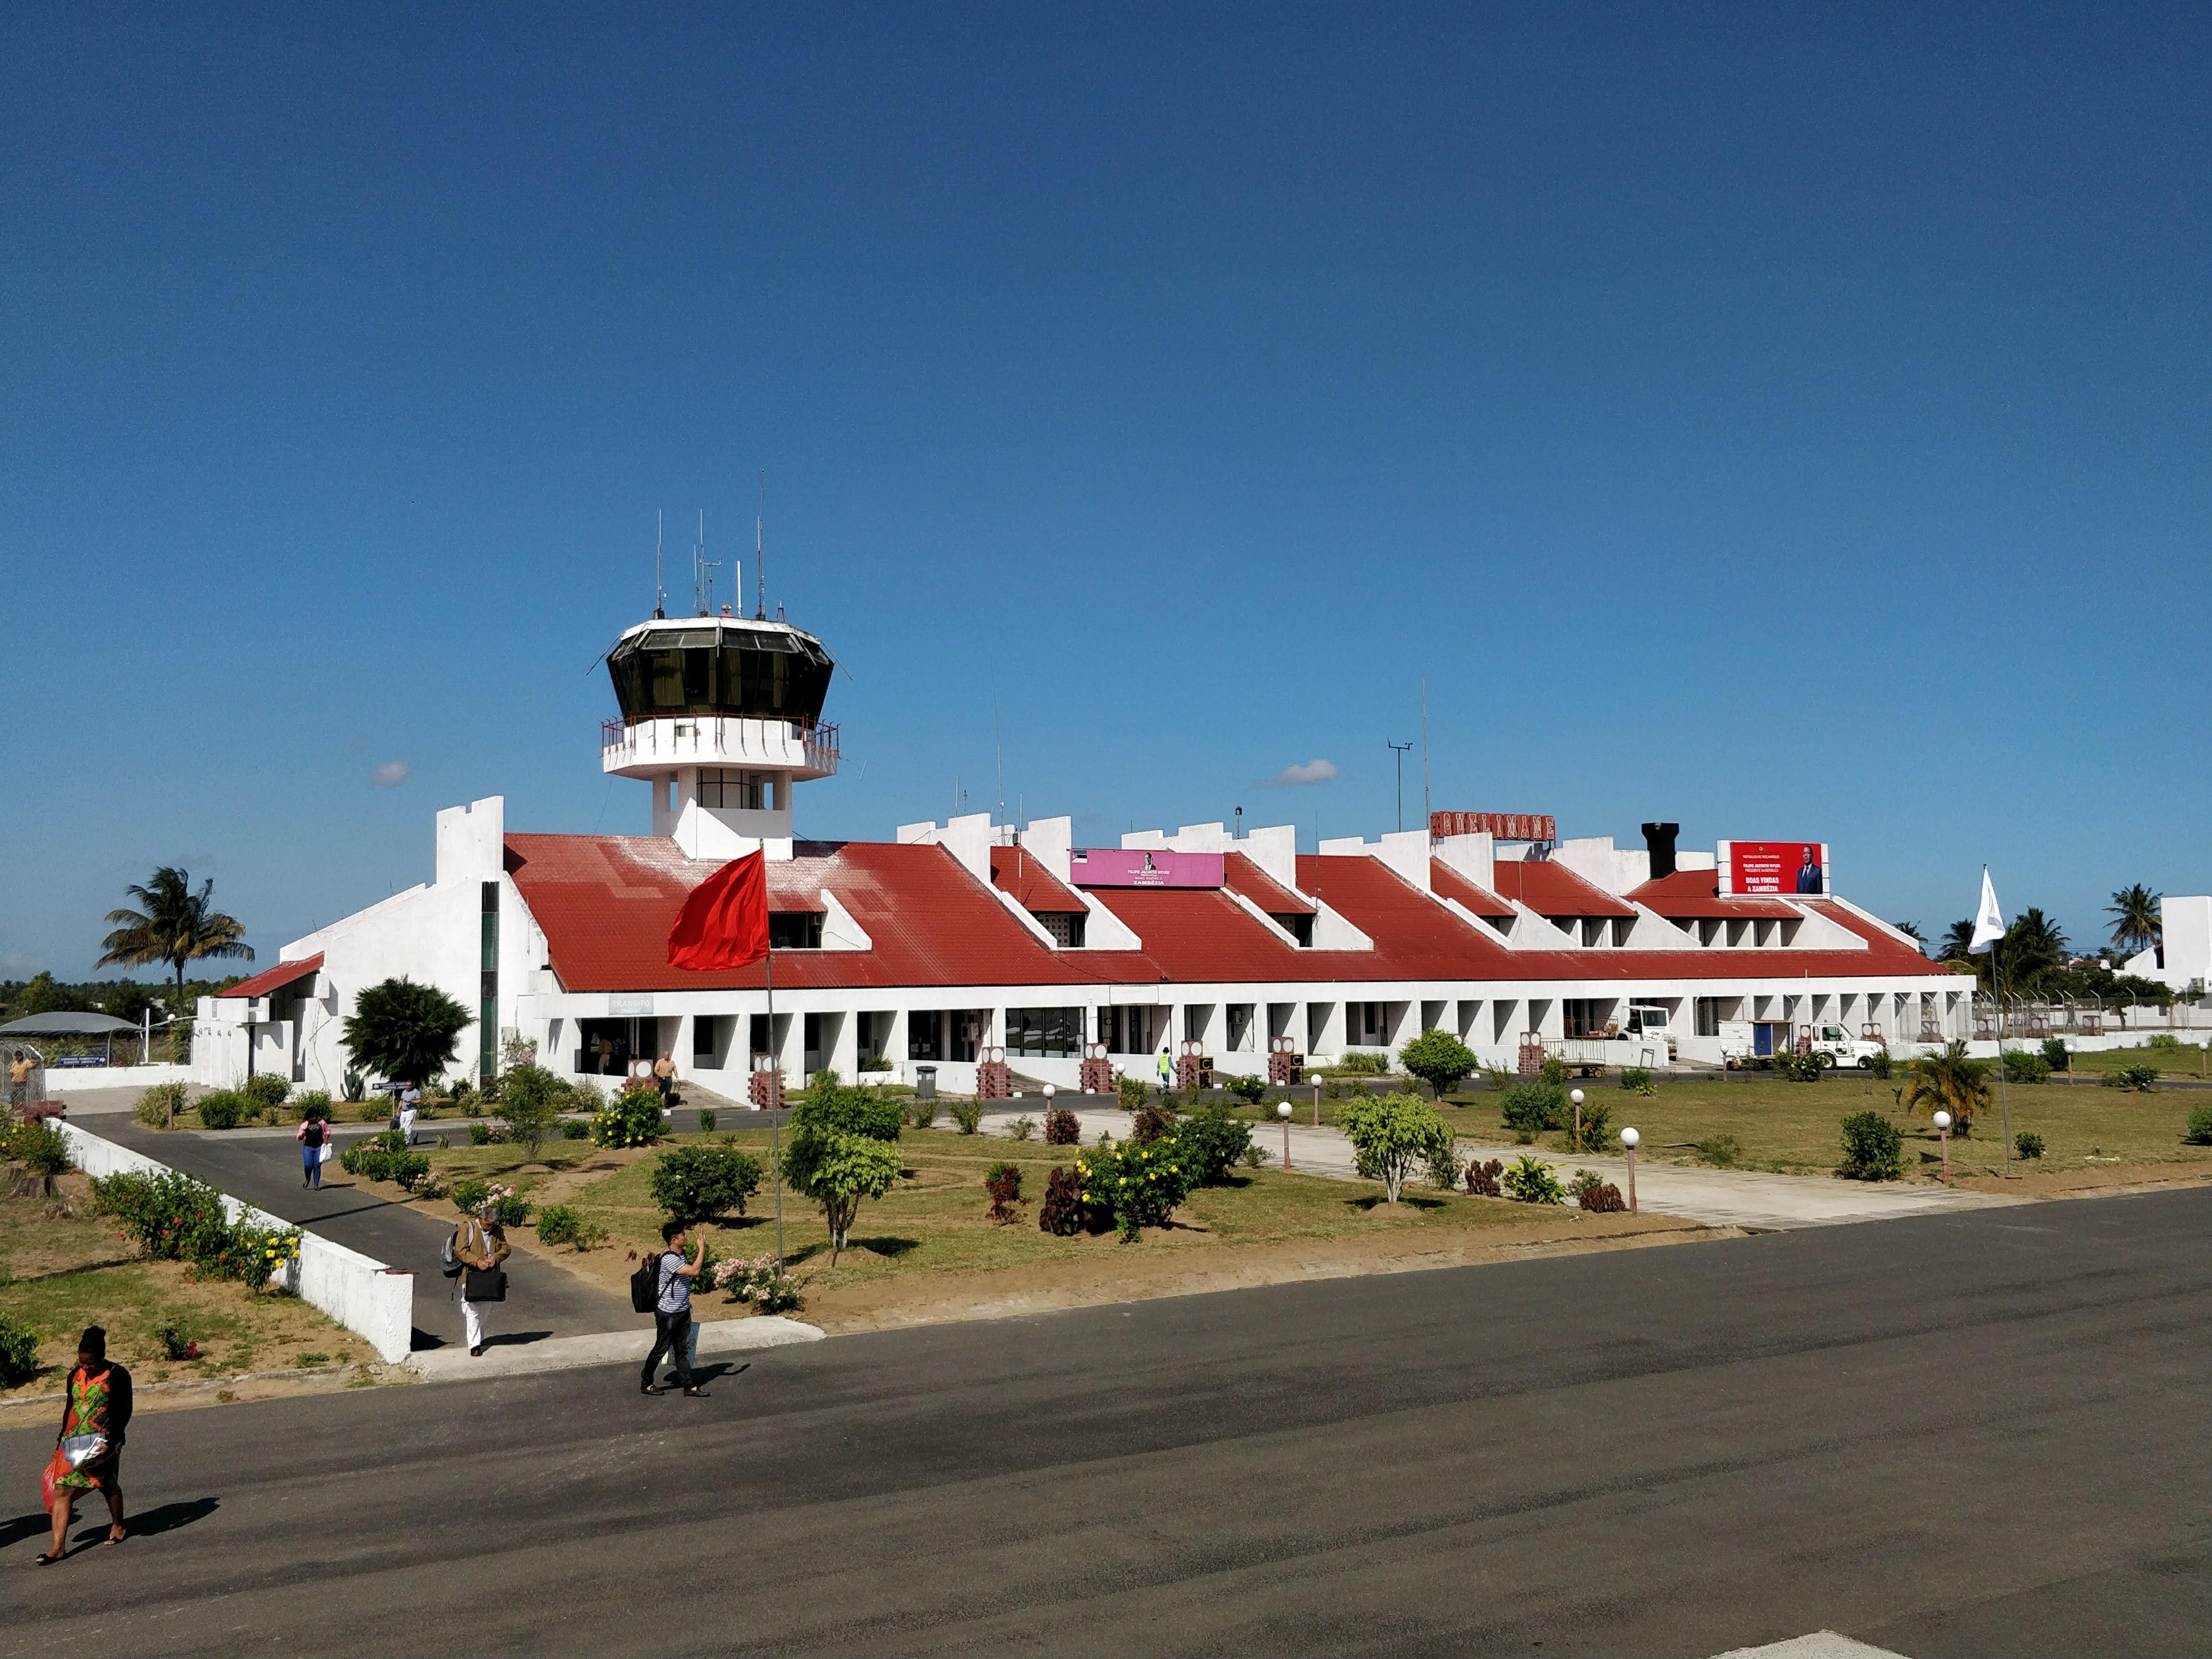 Aeroporto De Quelimane : File quelimane airport mozambique g wikipedia